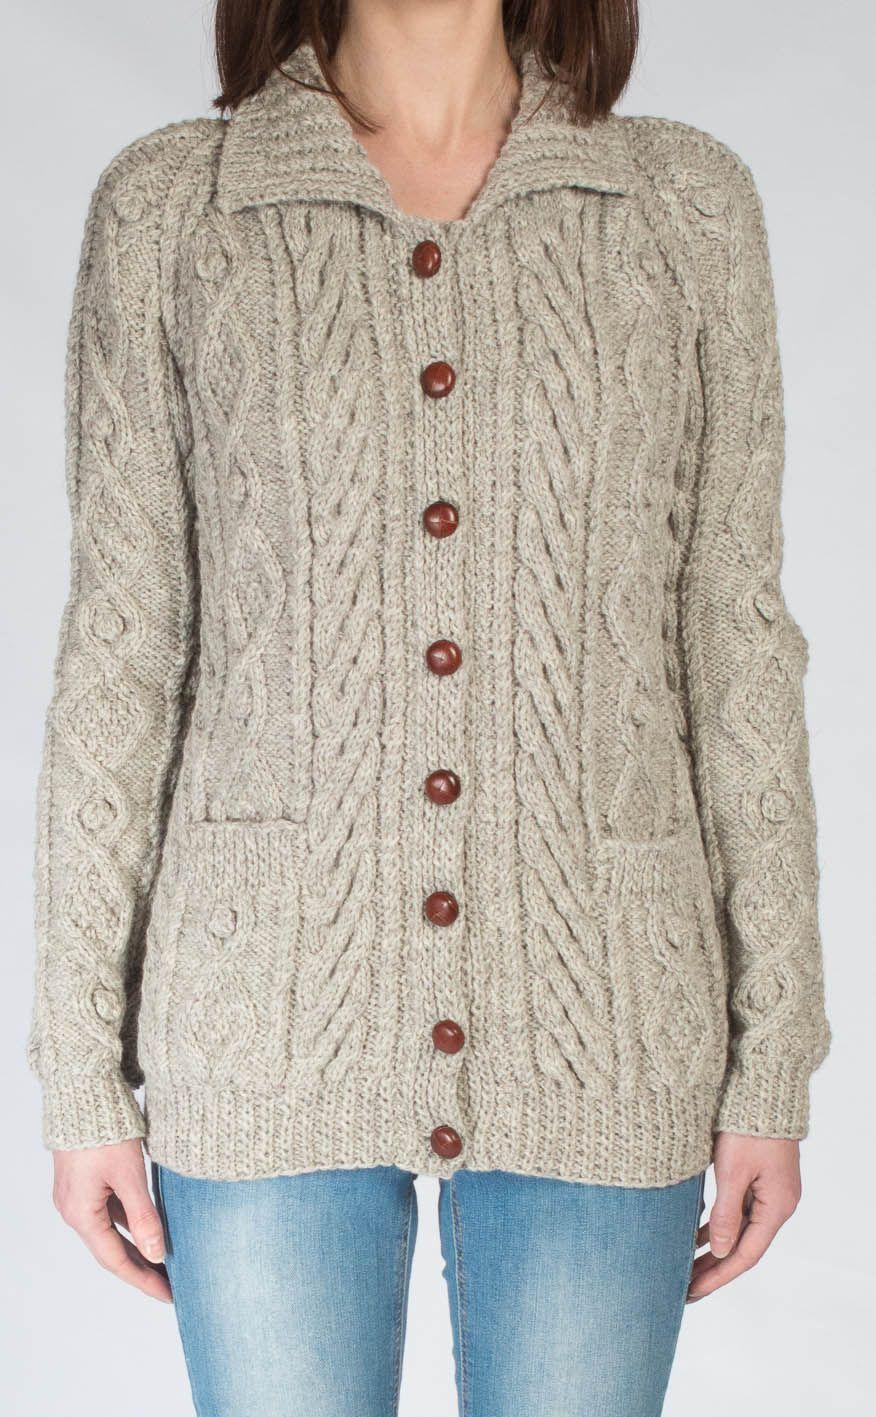 Ladies Luxury Hand-Knitted Aran Cardigan - Ness. Scotweb | knitting ...